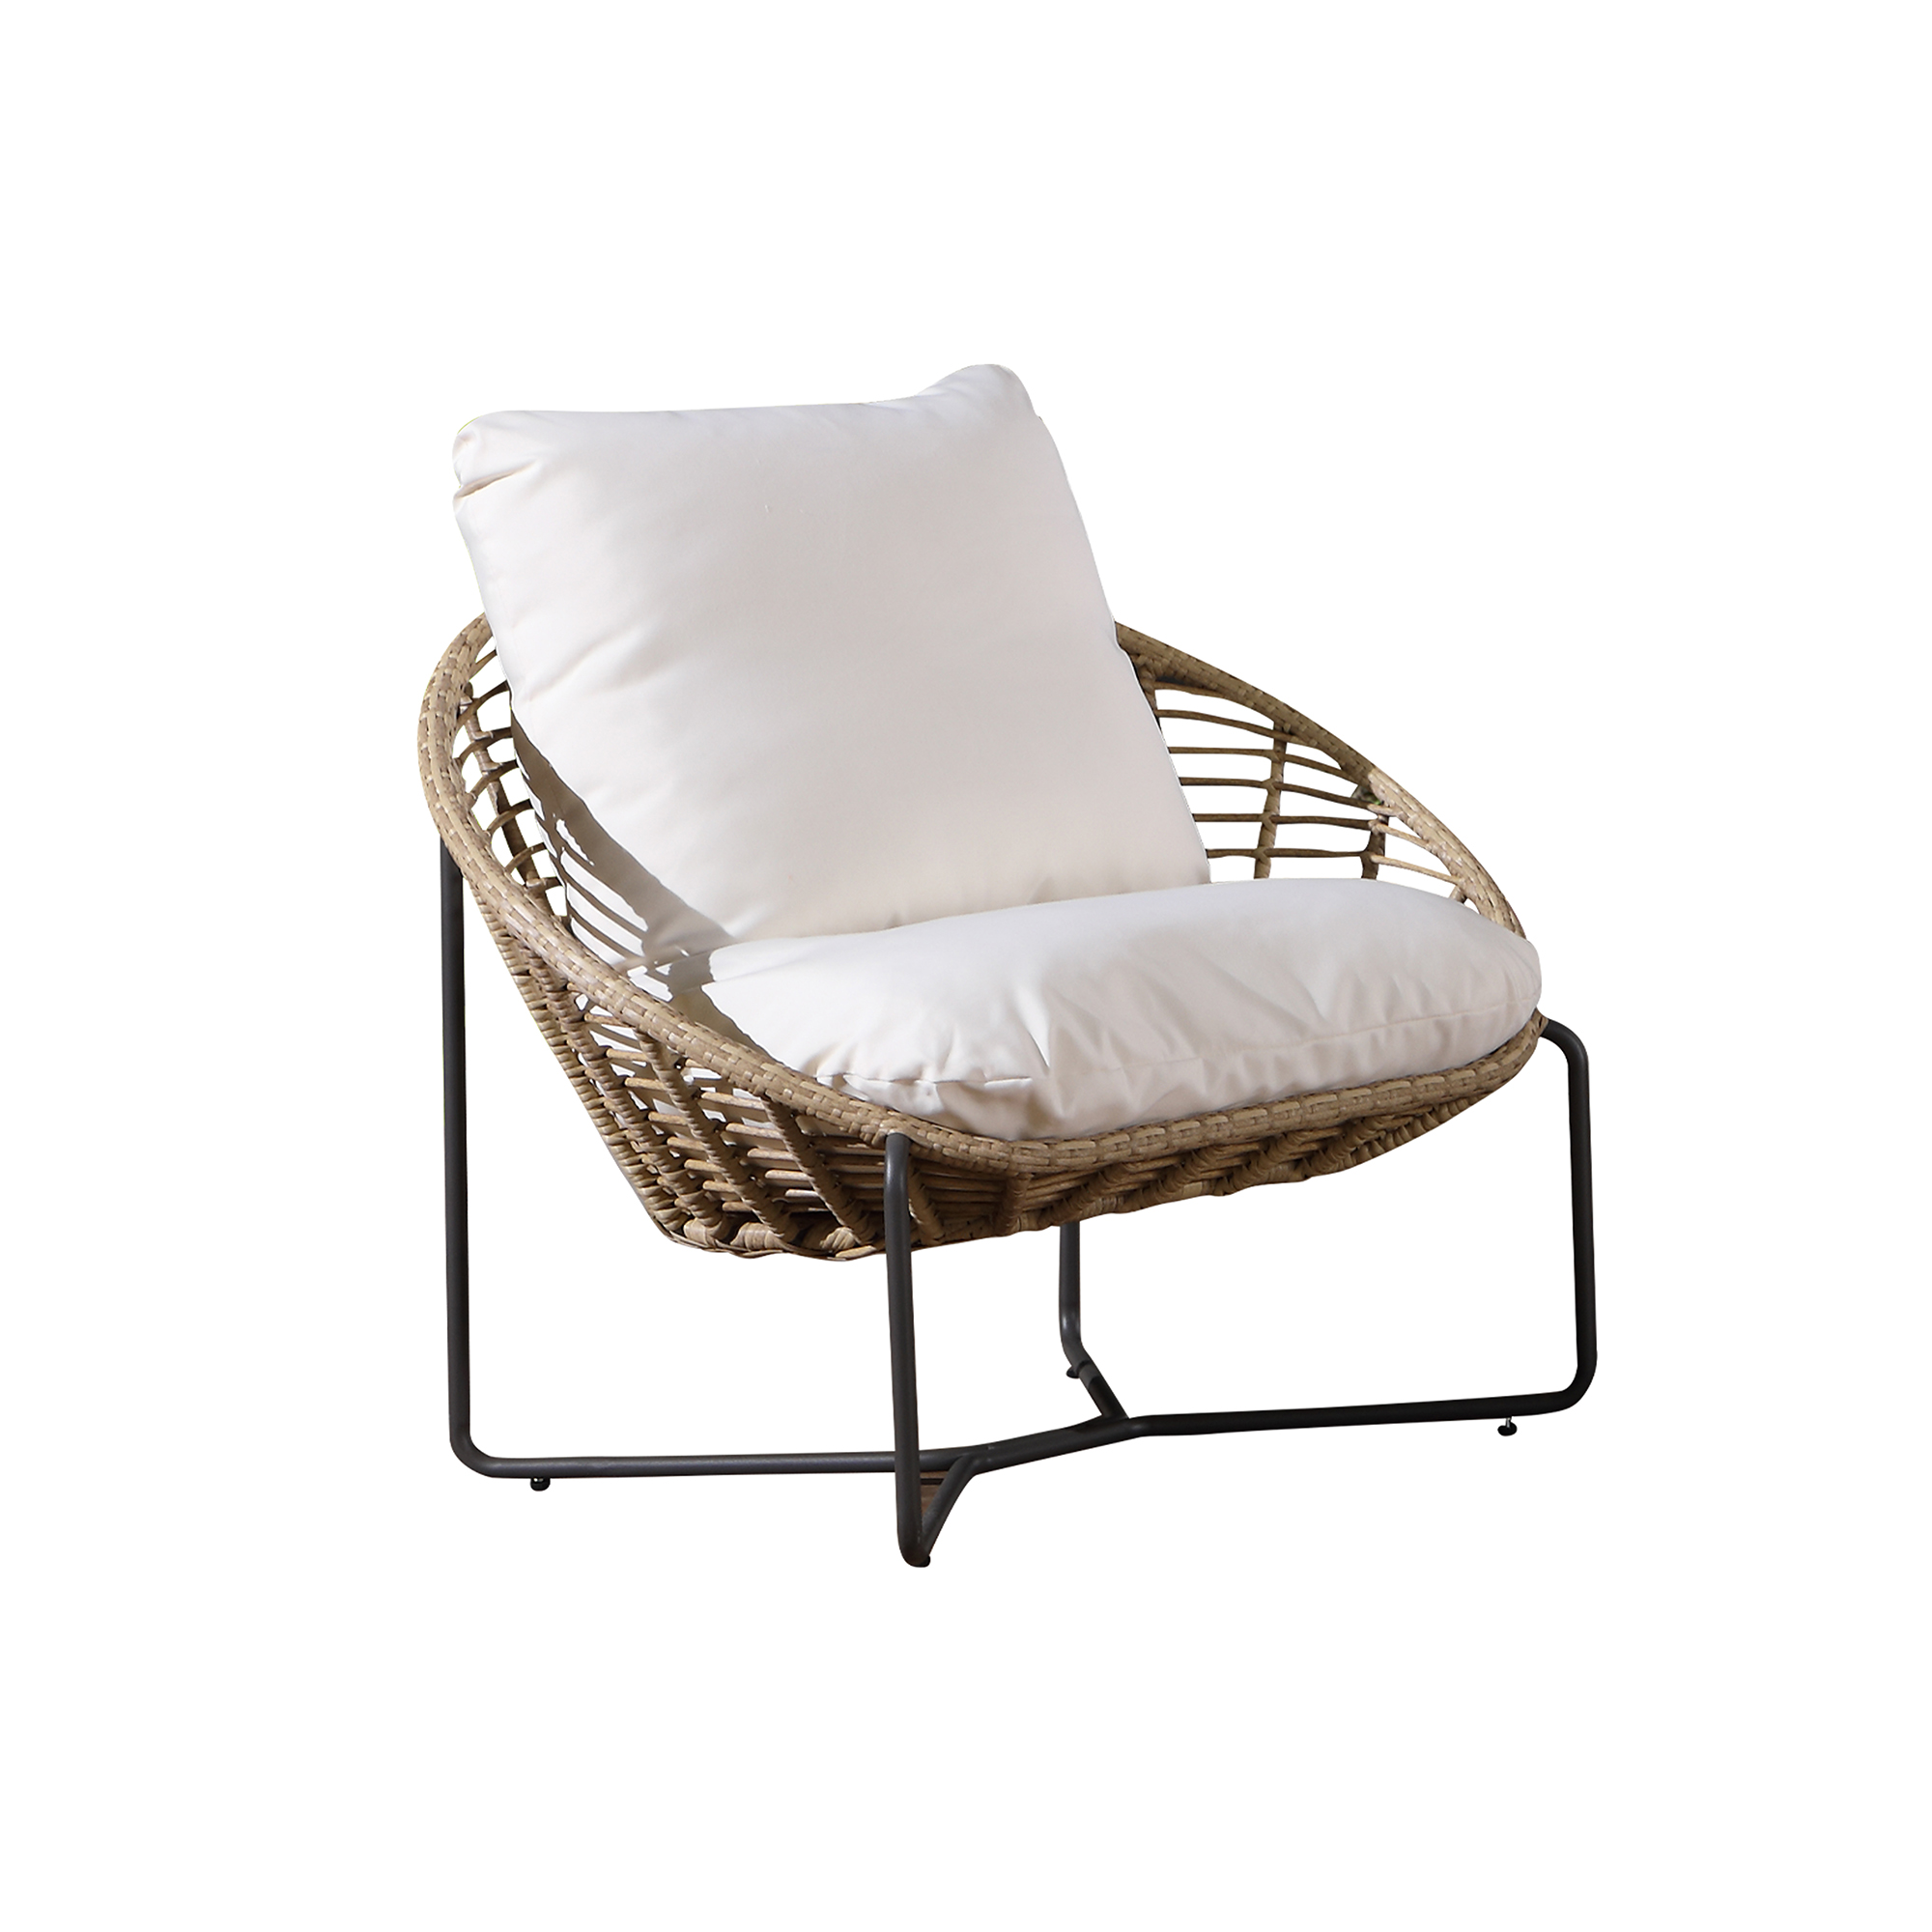 OD875 SOFA TIF 椅子